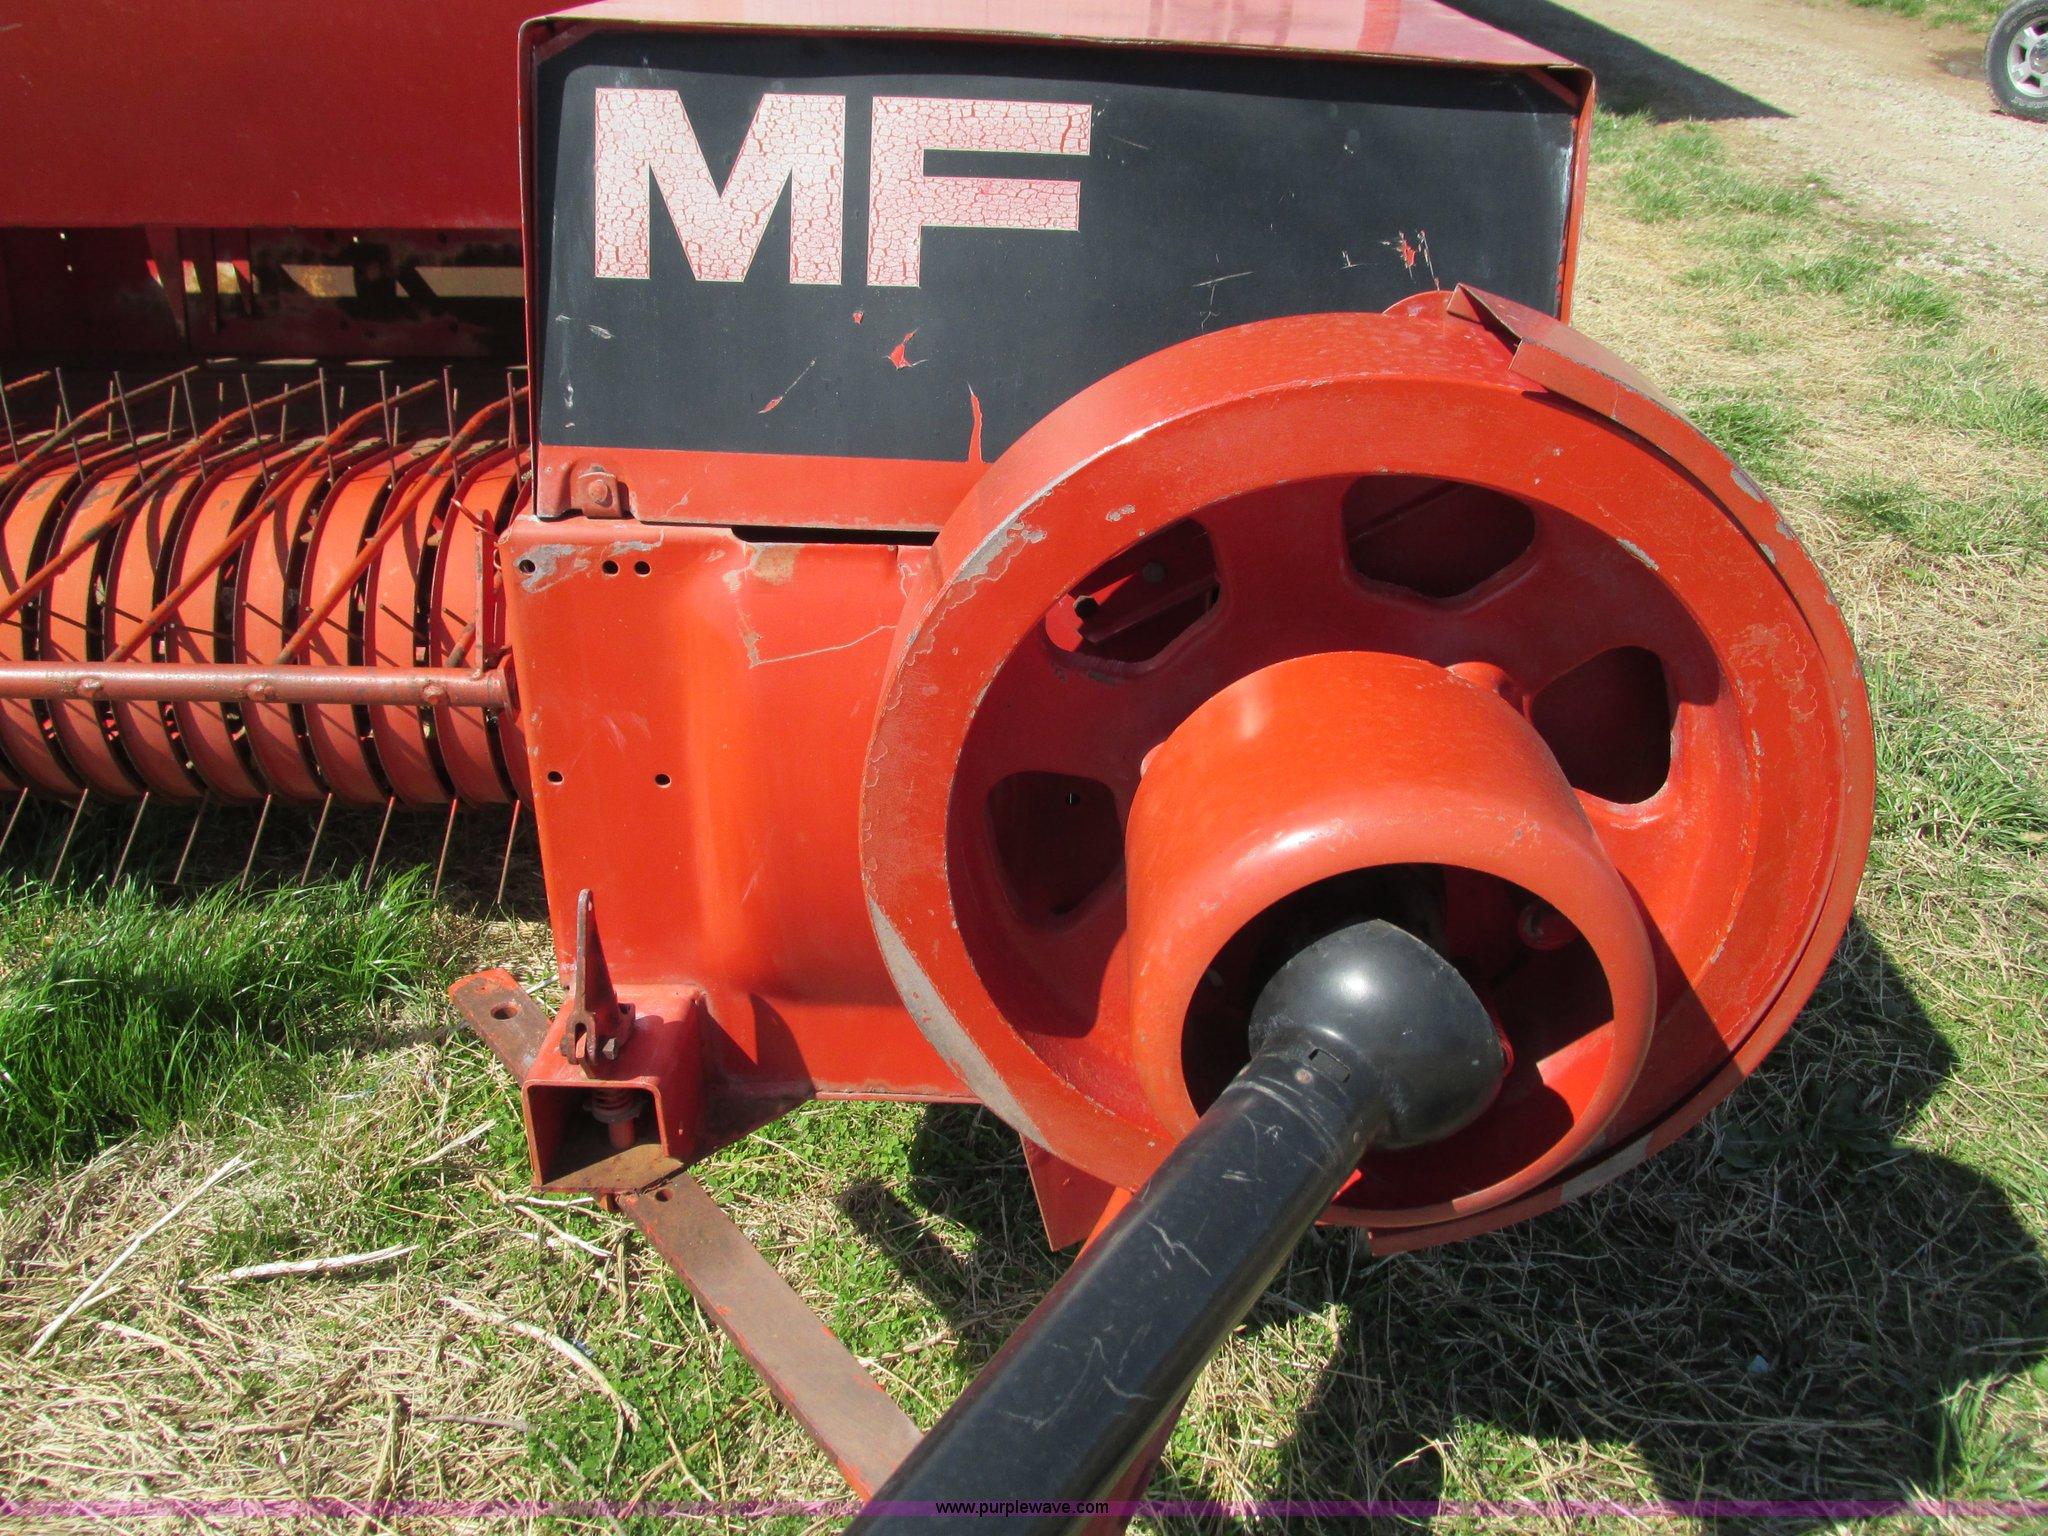 ... Massey-Ferguson MF130 small square baler Full size in new window ...